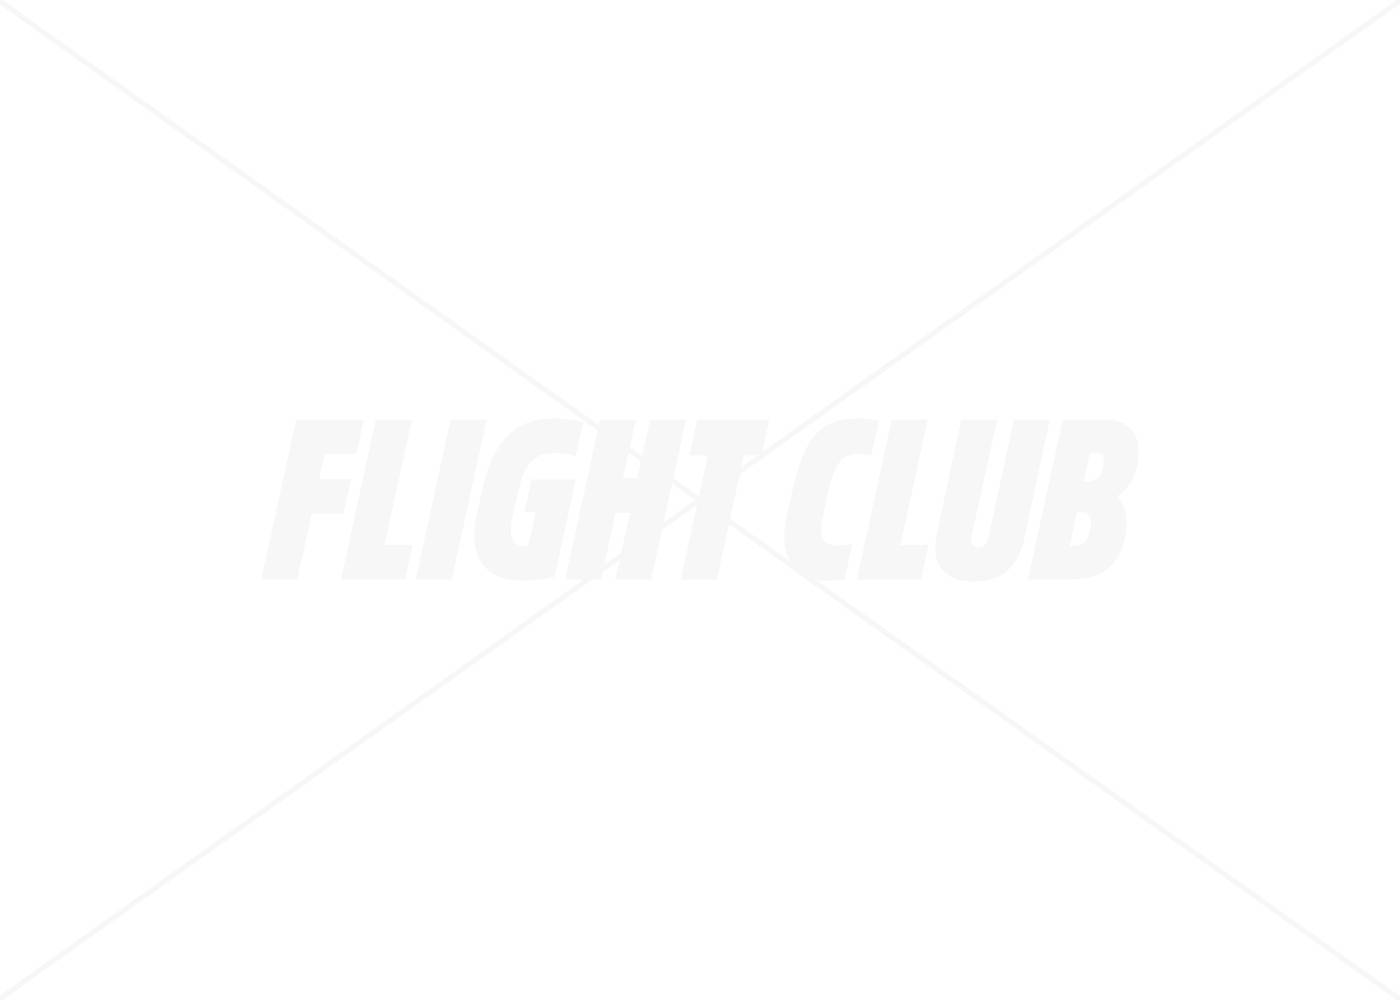 308cf9470b8 free shipping new york yankees turquoise hat size chart 17b56 8c4f2